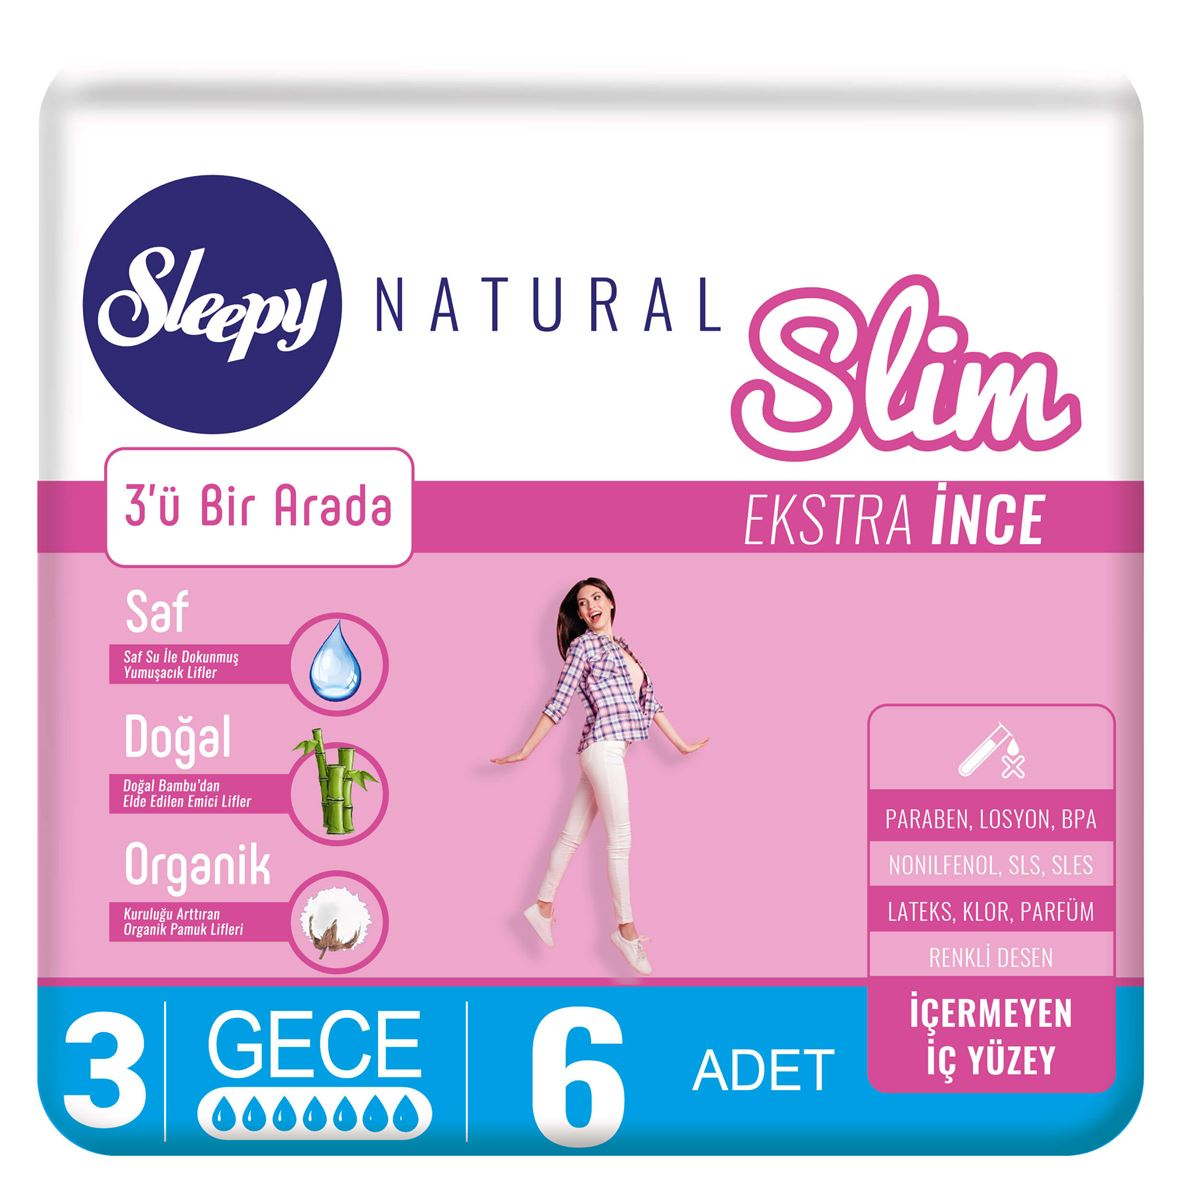 Sleepy Natural Slim Ekstra İnce Gece (6 Ped)